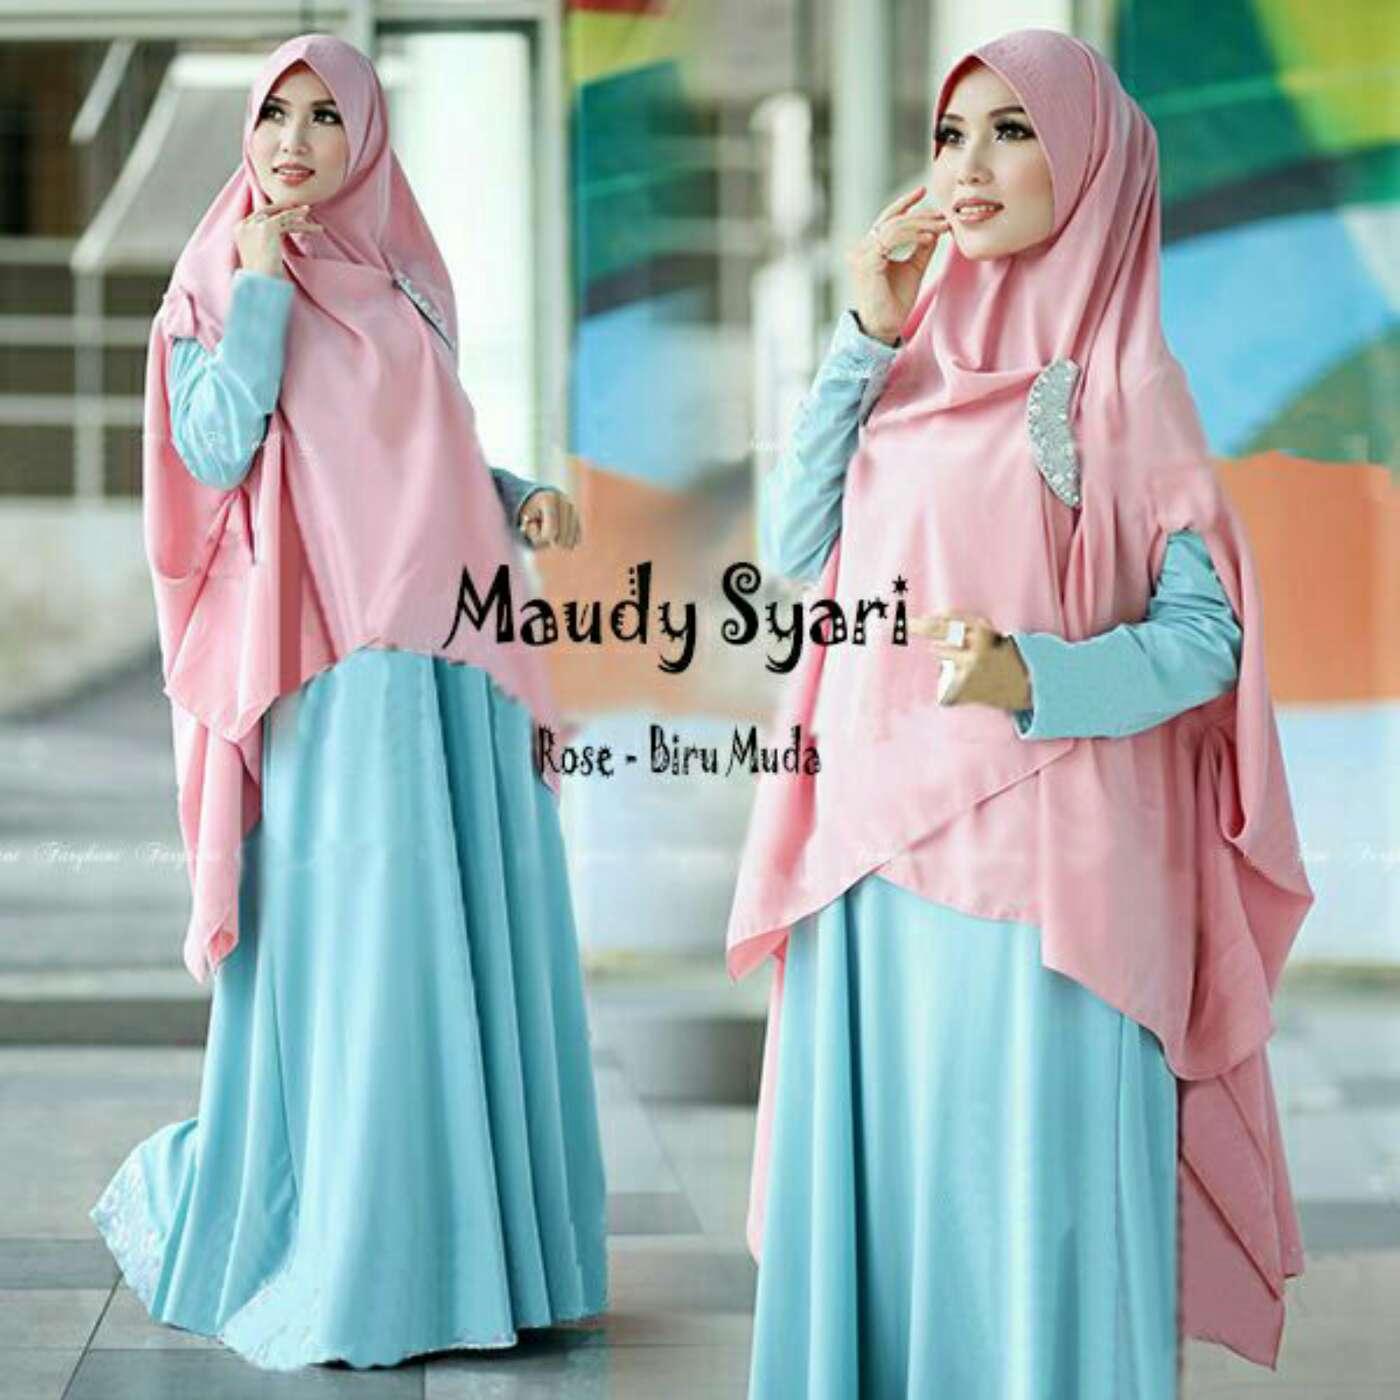 Model-Baju-Gamis-Syari-Modern-Terbaru-Cantik-dan-Murah-Warna-Biru.jpg